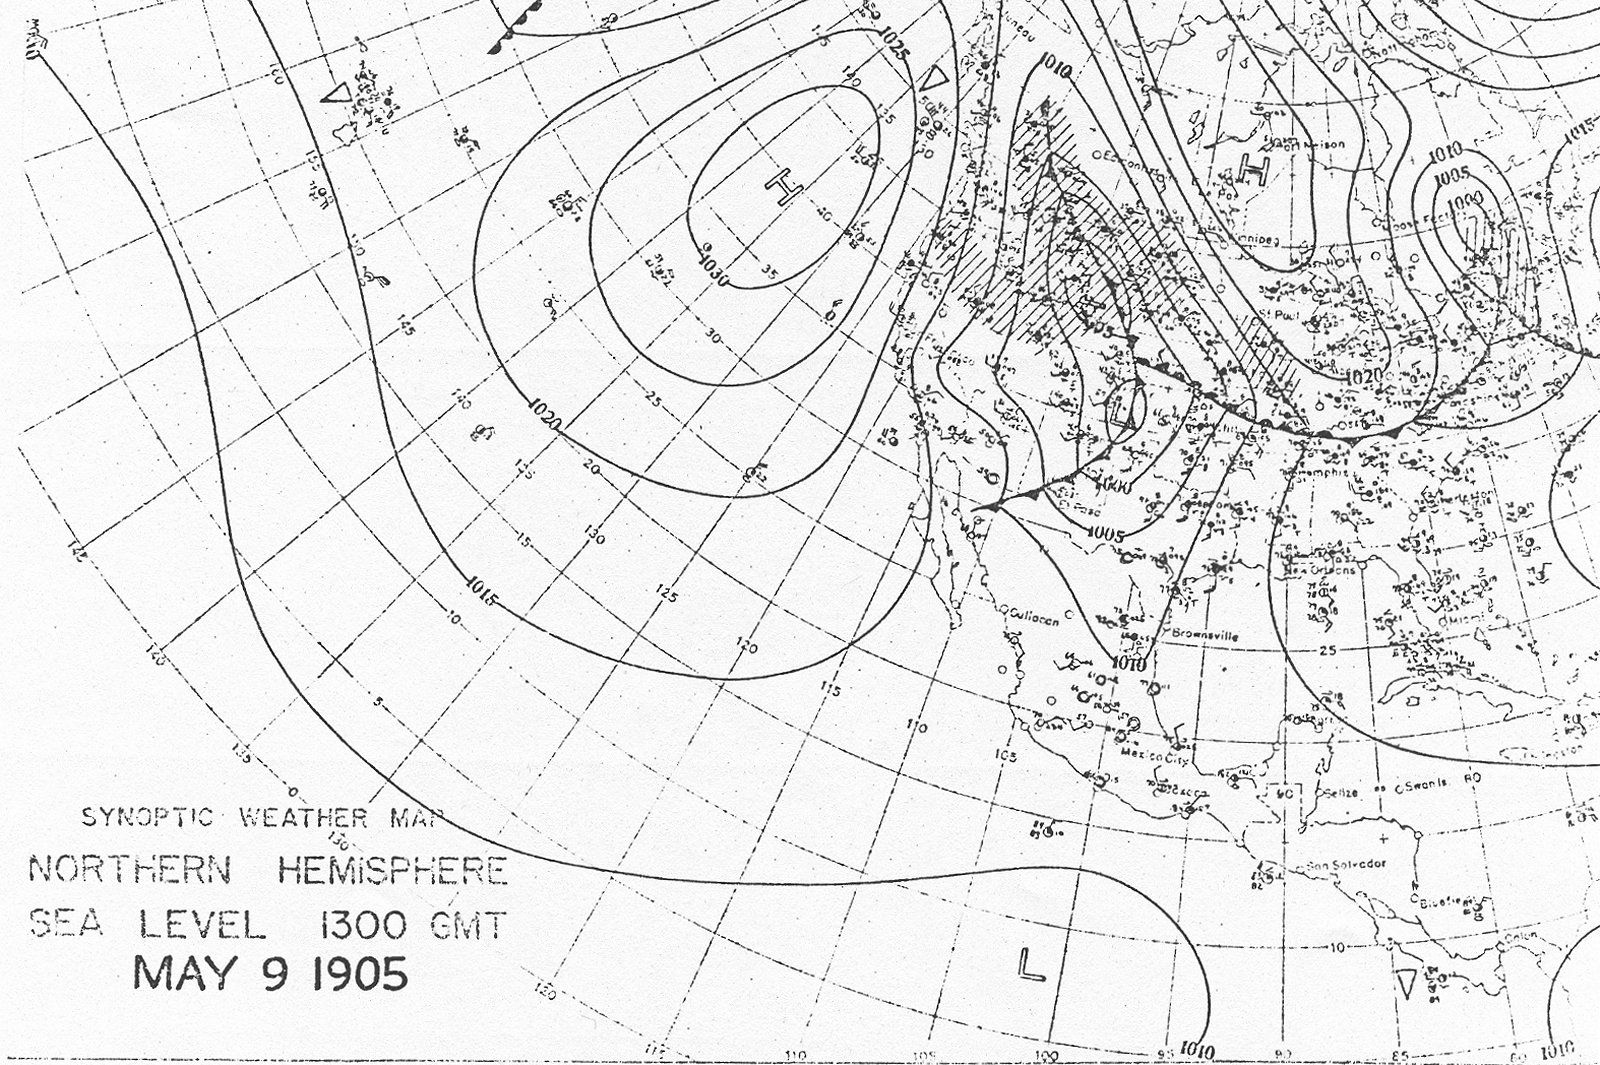 Infographic Synoptic Weather Map Northern Hemisphere Sea Level